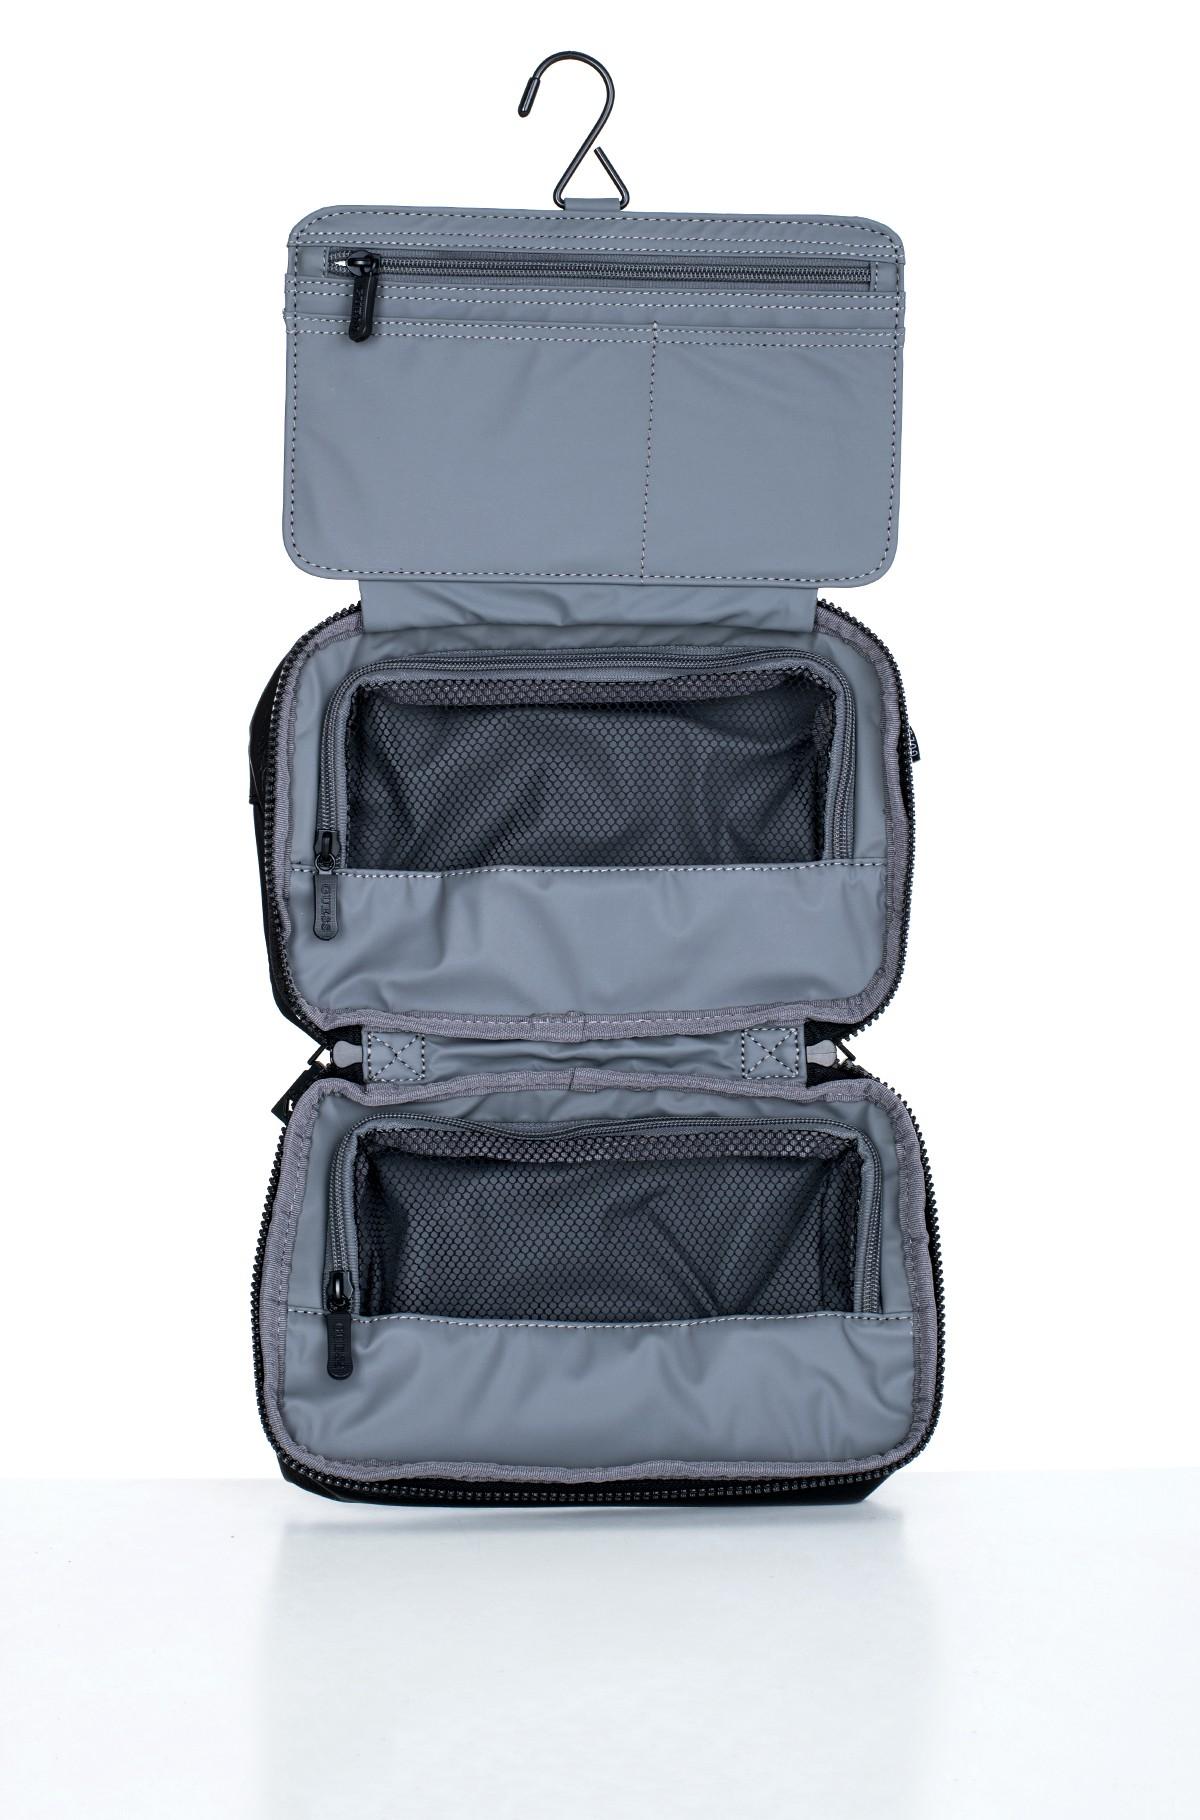 Hügieenitarvete kott HMMSM1 P1142-full-3